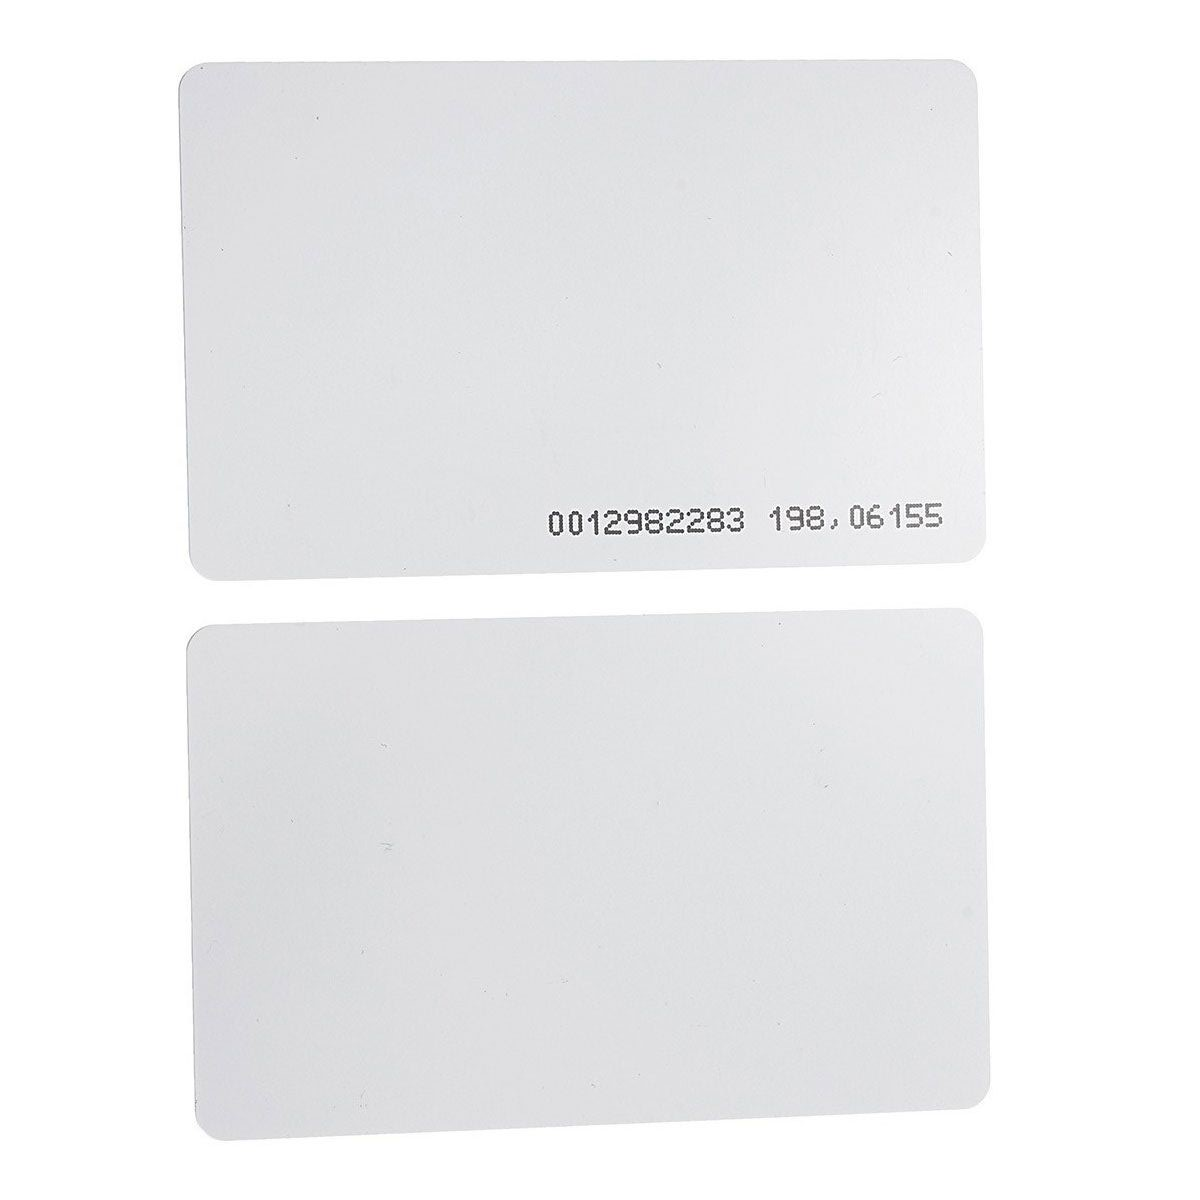 Cartão RFID 125 KHz PVC - 50 unidades